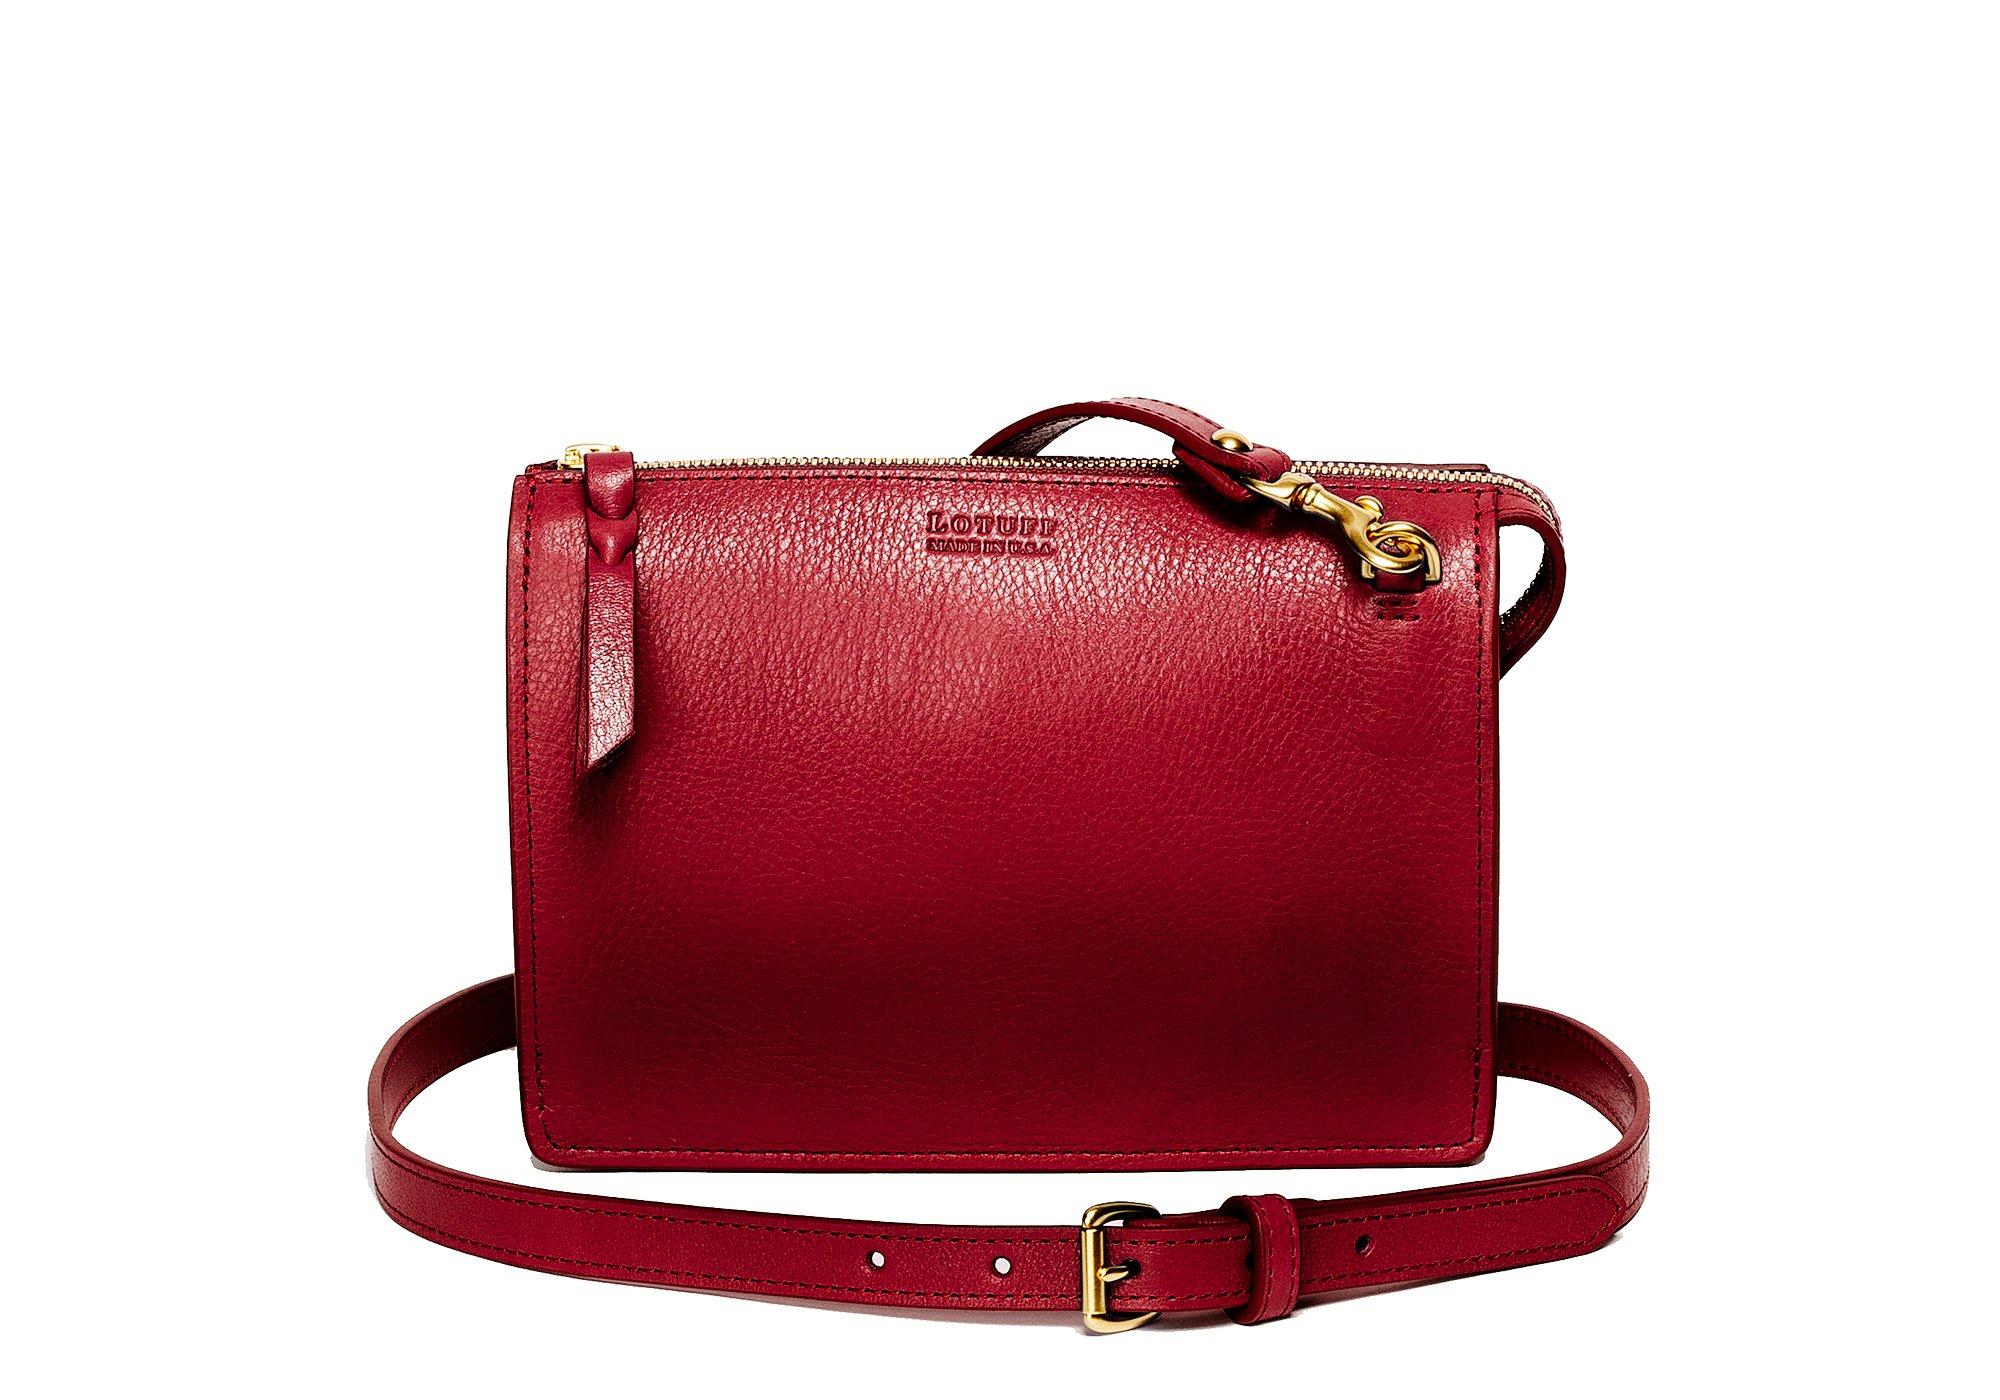 Lotuff_Leather_Tripp_Handbag_Red_1_2000x.progressive